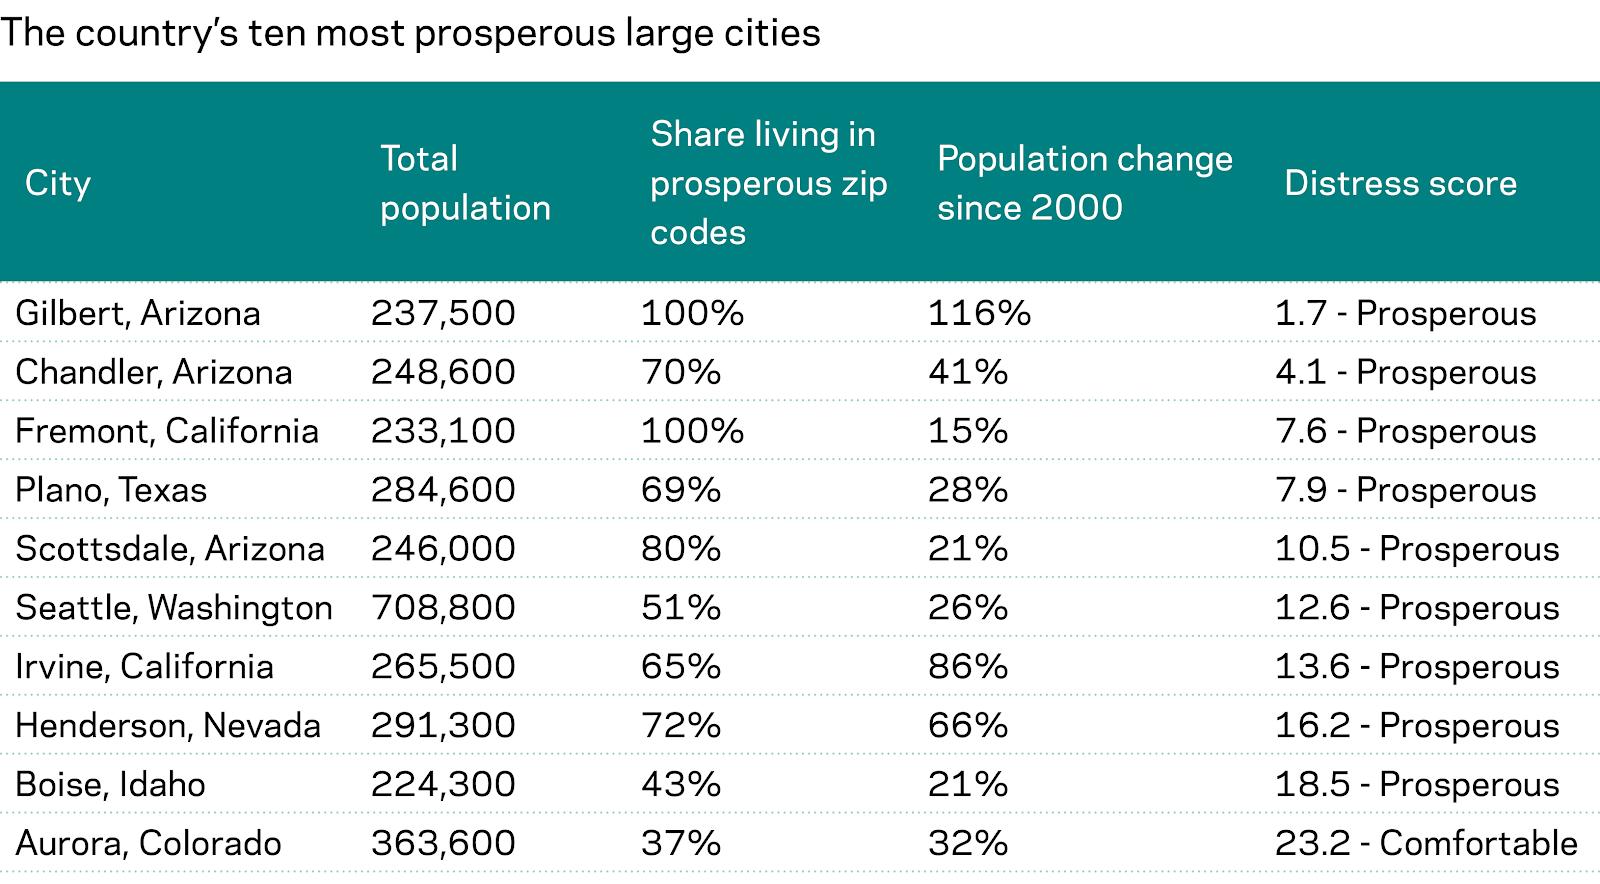 Top ten most prosperous large cities